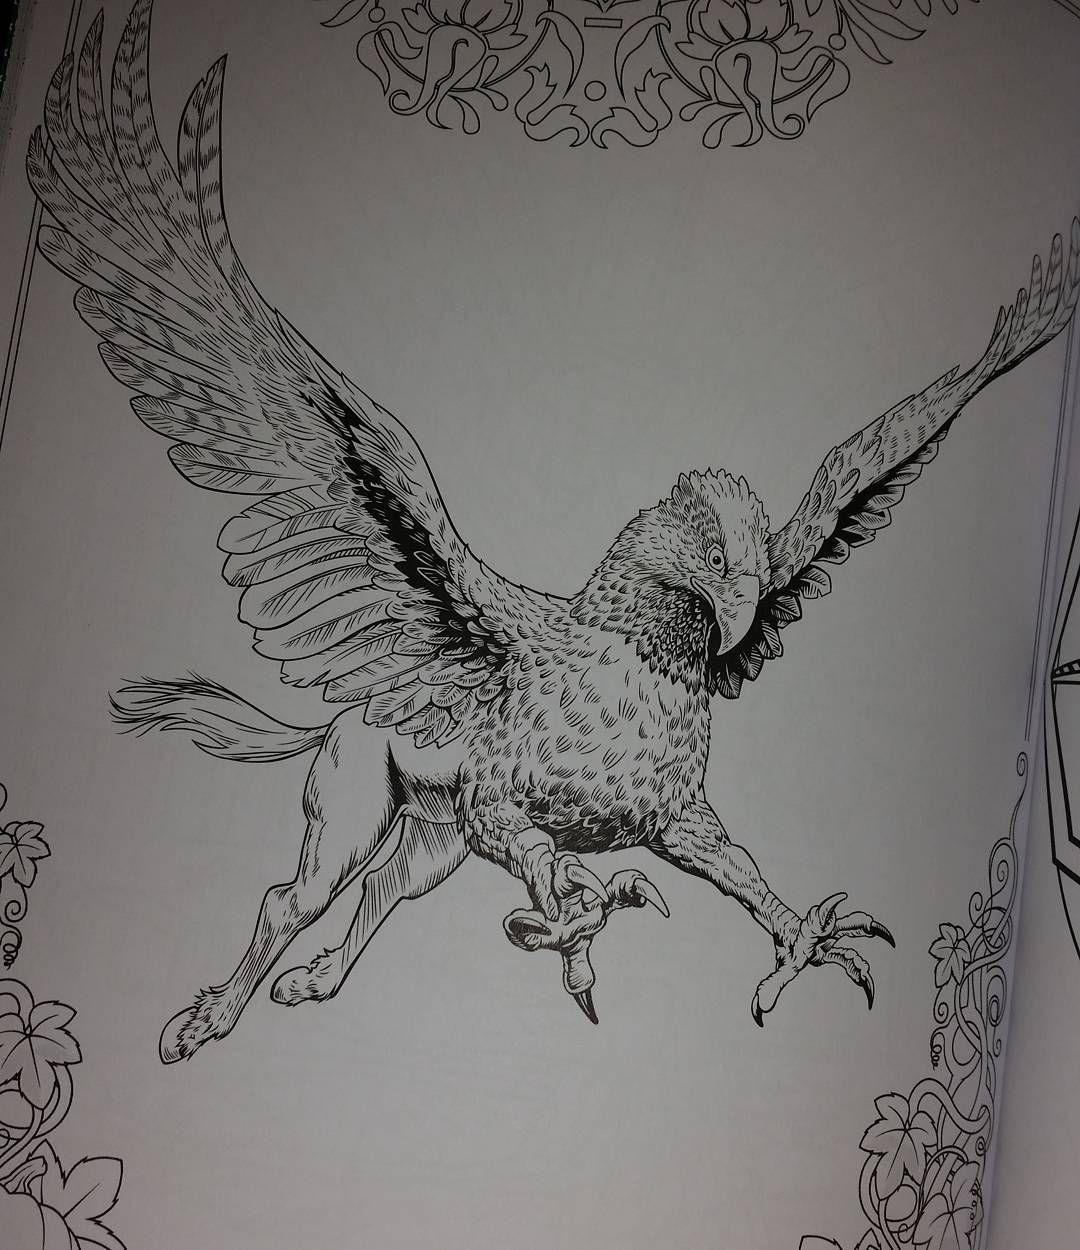 #lieblingswesen #hpplanerchallenge #harrypotter #harrypottercollection #19 #filofax #filofaxing by rinaninajackson